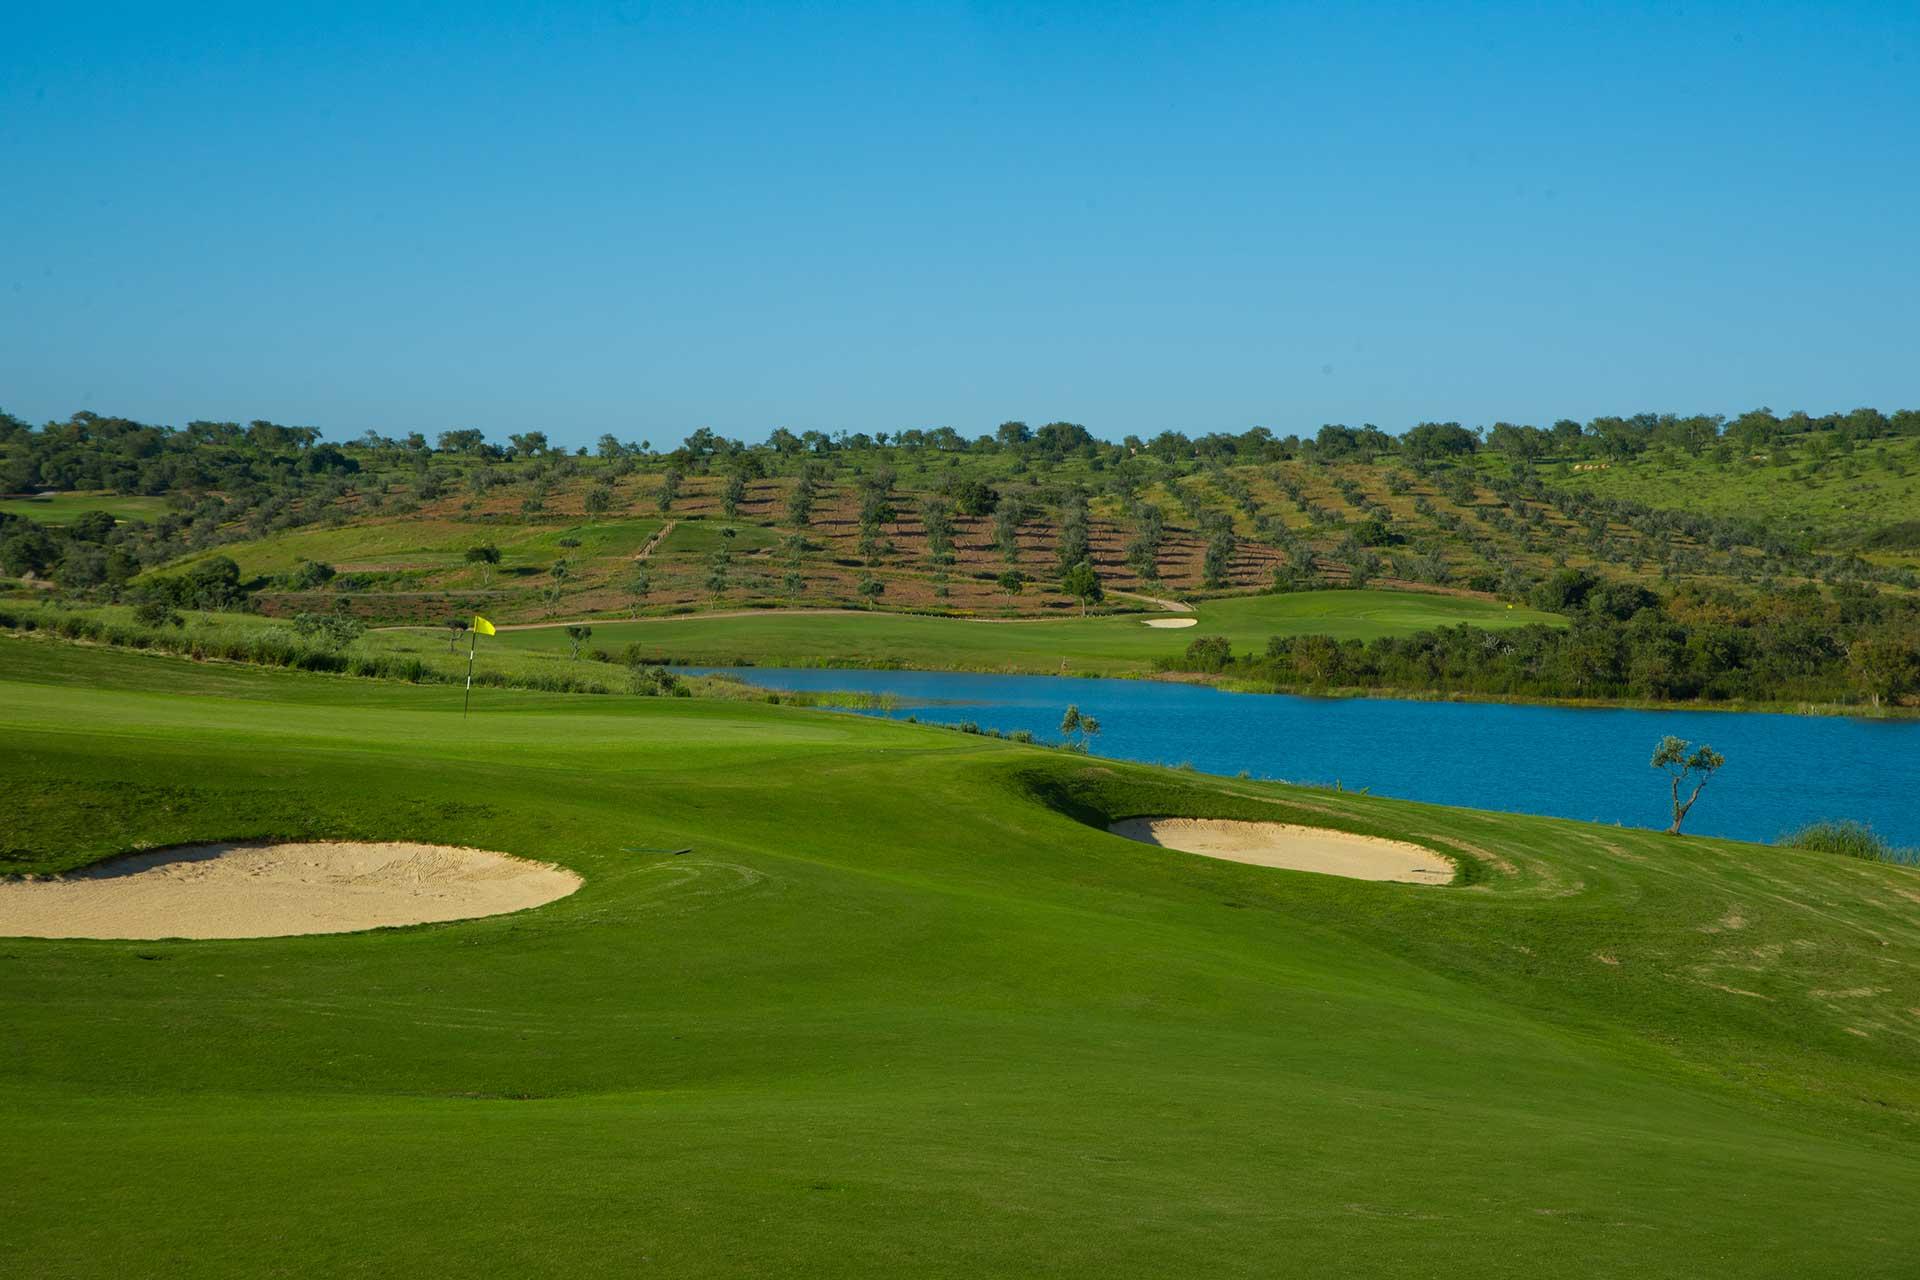 Golf-expedition-golfreizen-golfresort-Morgado-Golf-&-Country-Club-golf-course-hole-2